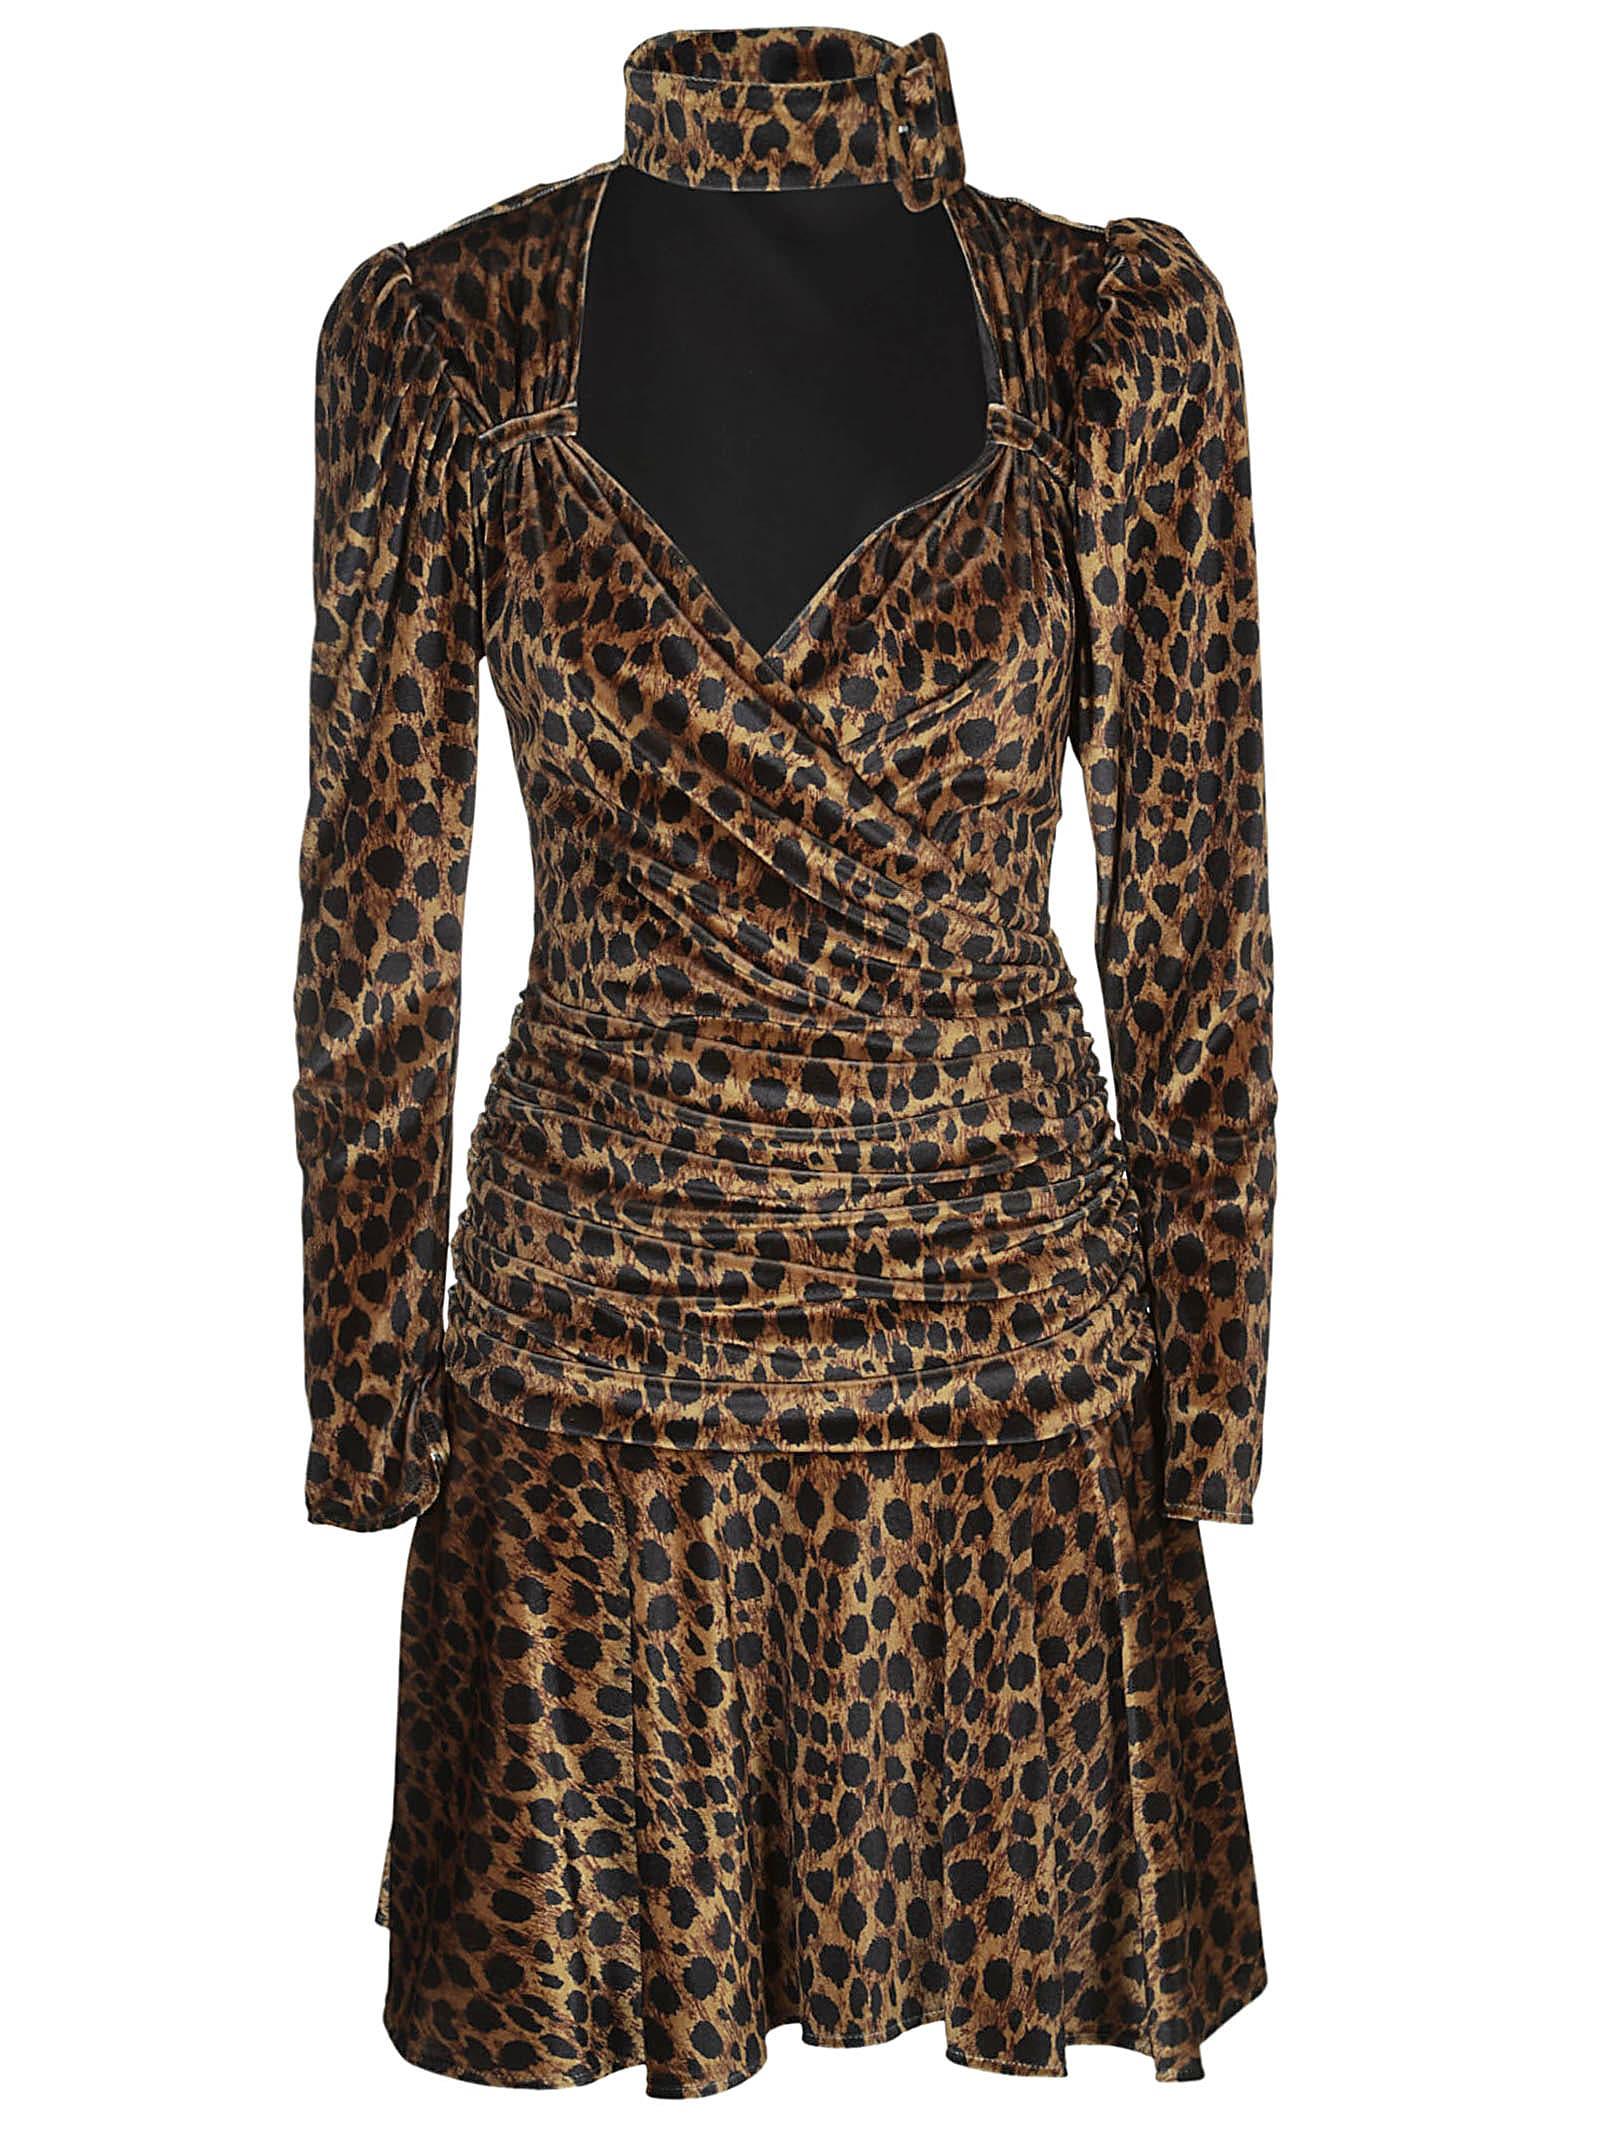 The Attico Leopard Print Mini Dress